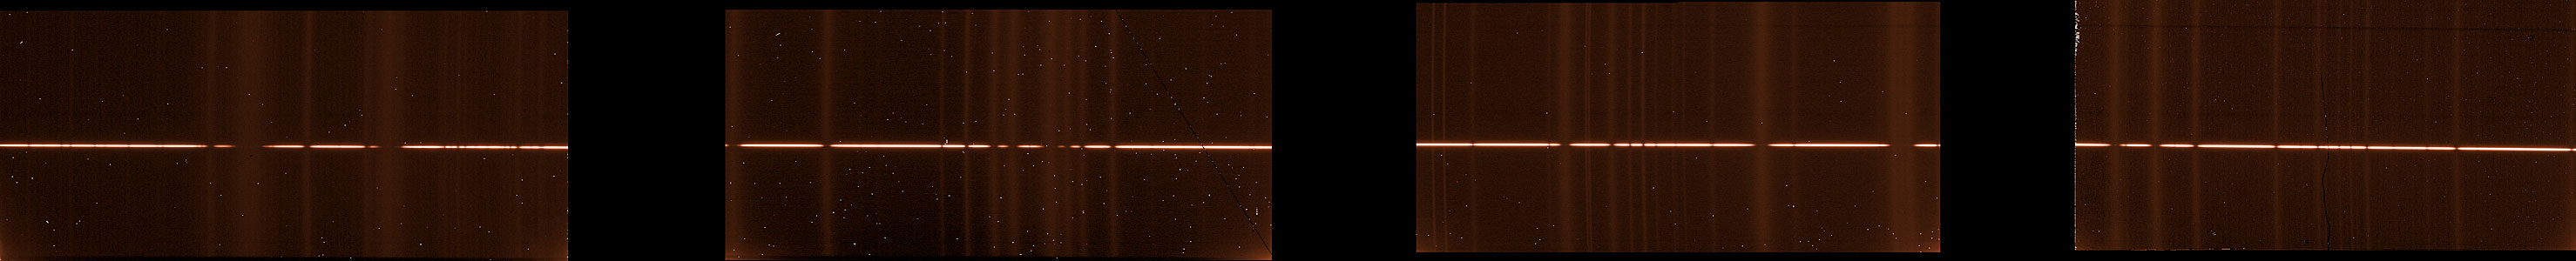 The spectrum of star HR7235